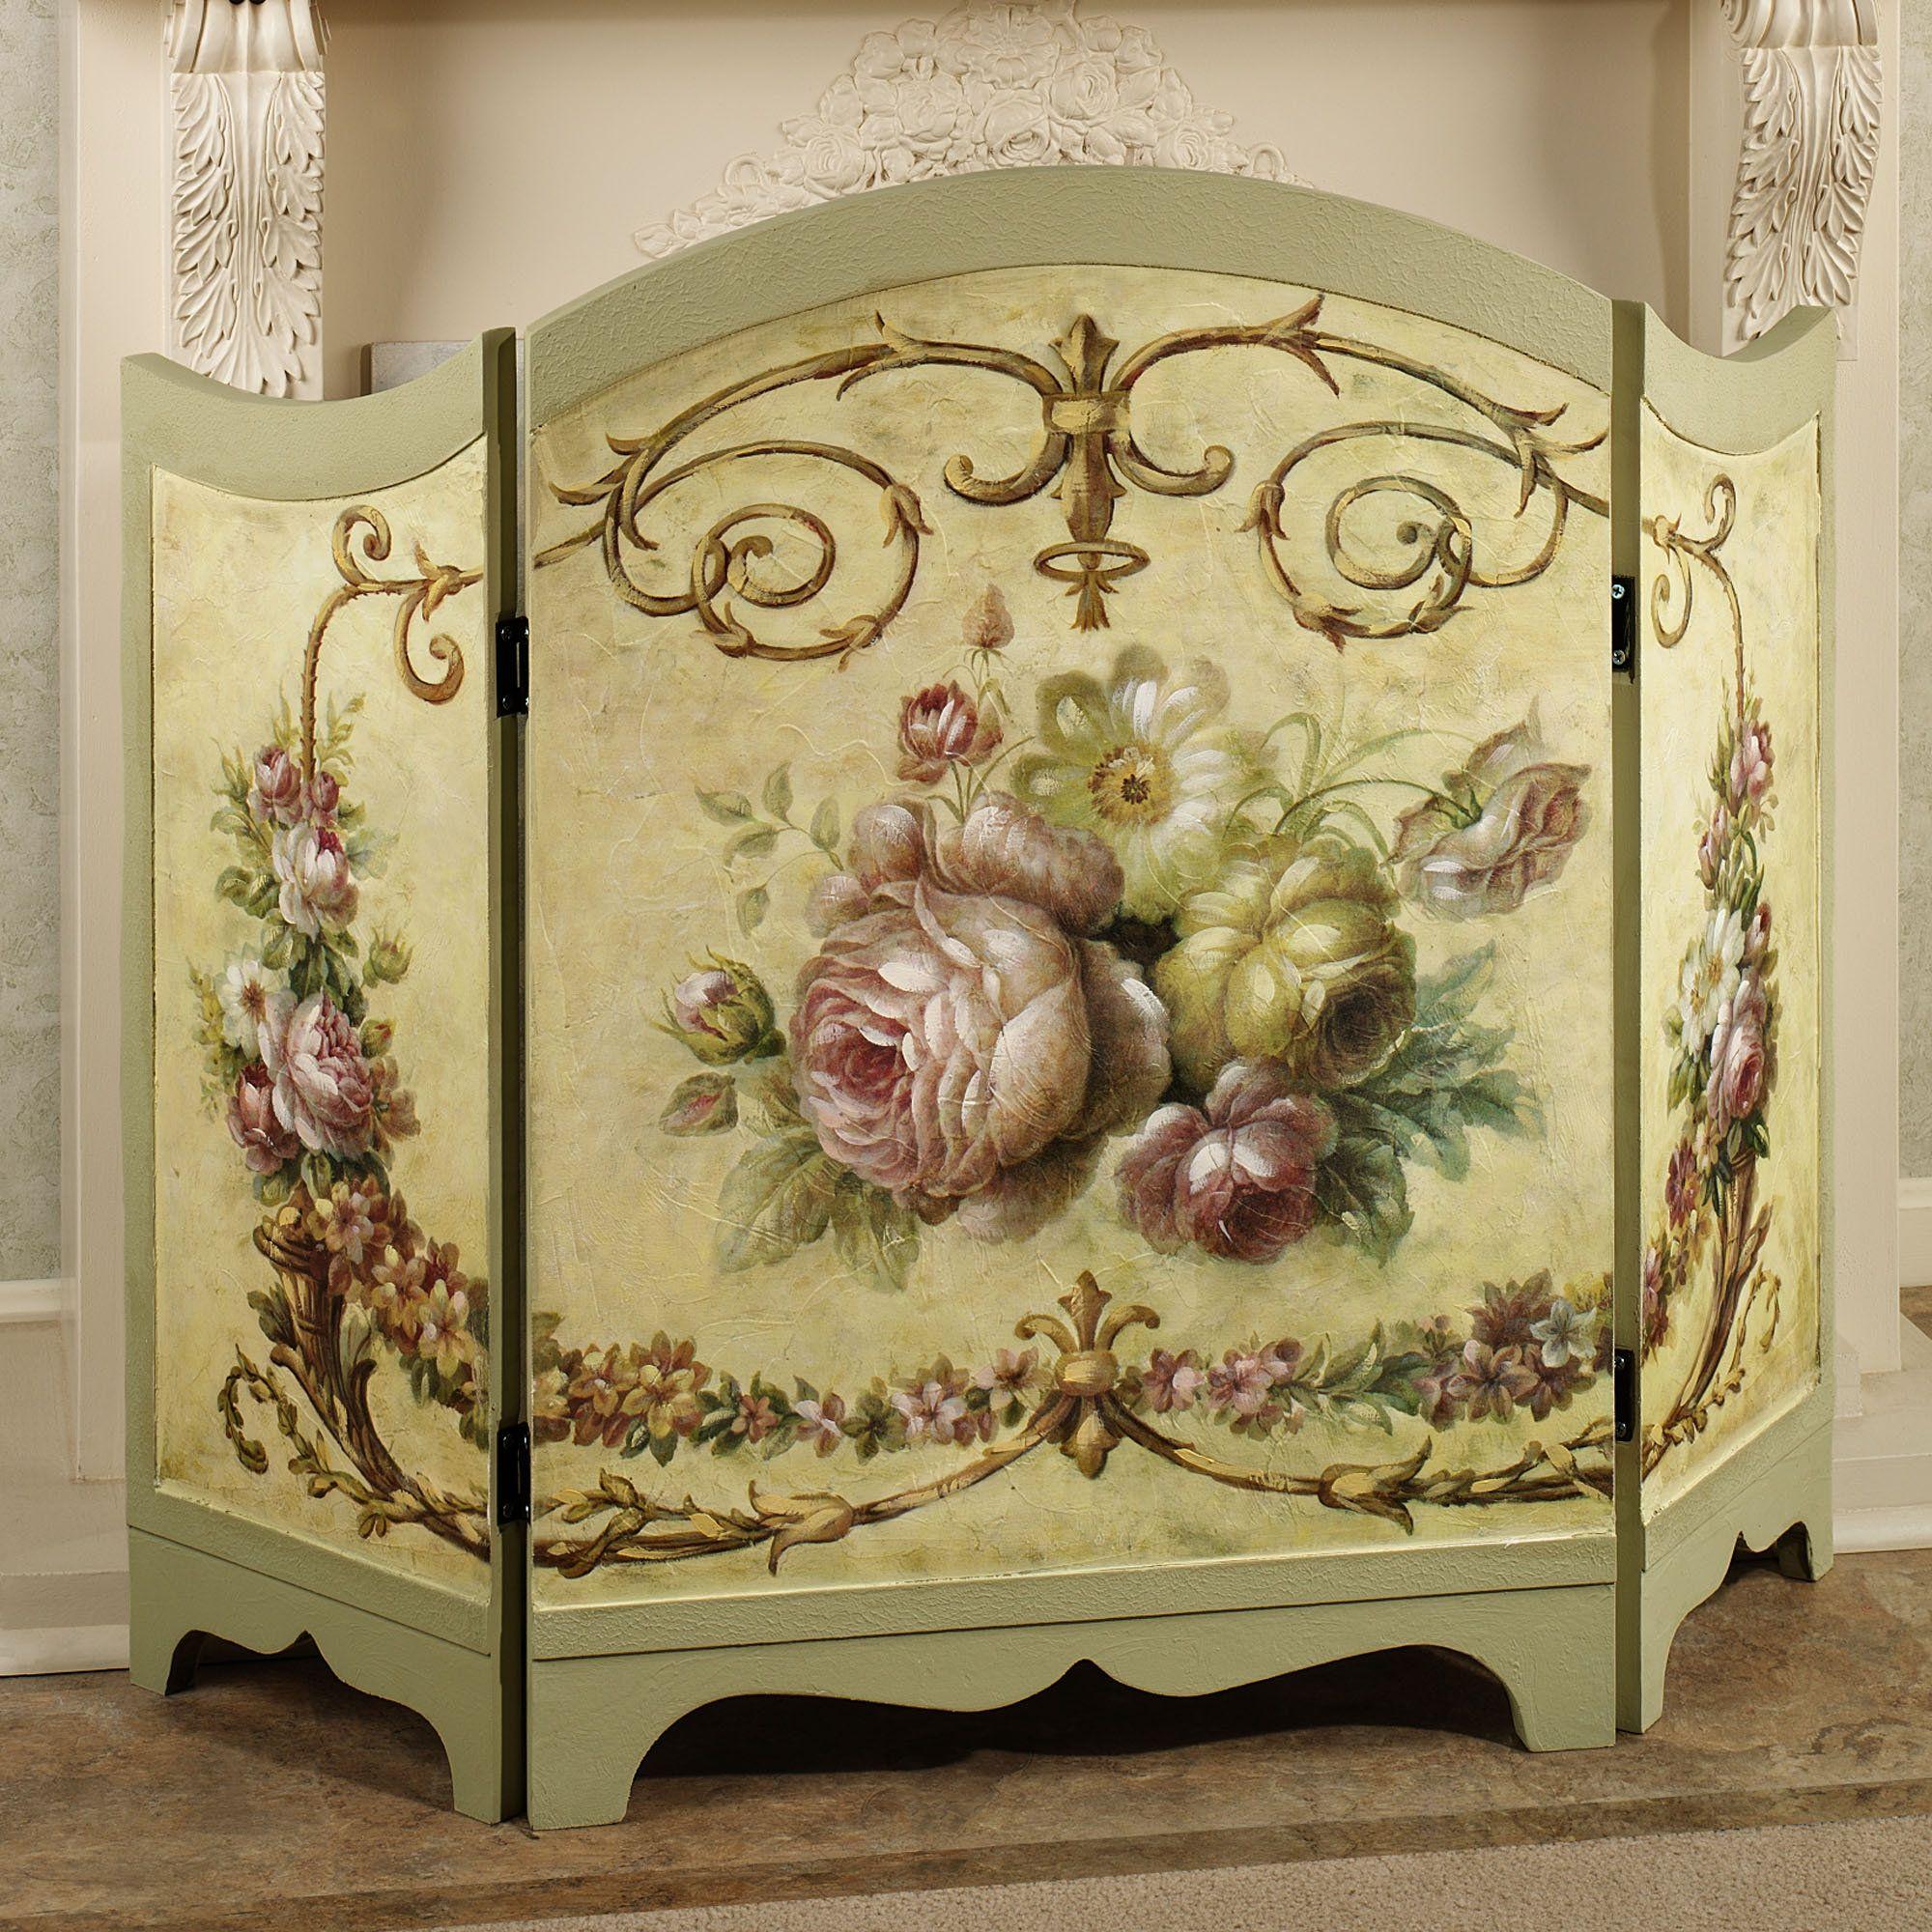 victorian rose decorative fireplace screen lovely lounge rh pinterest com